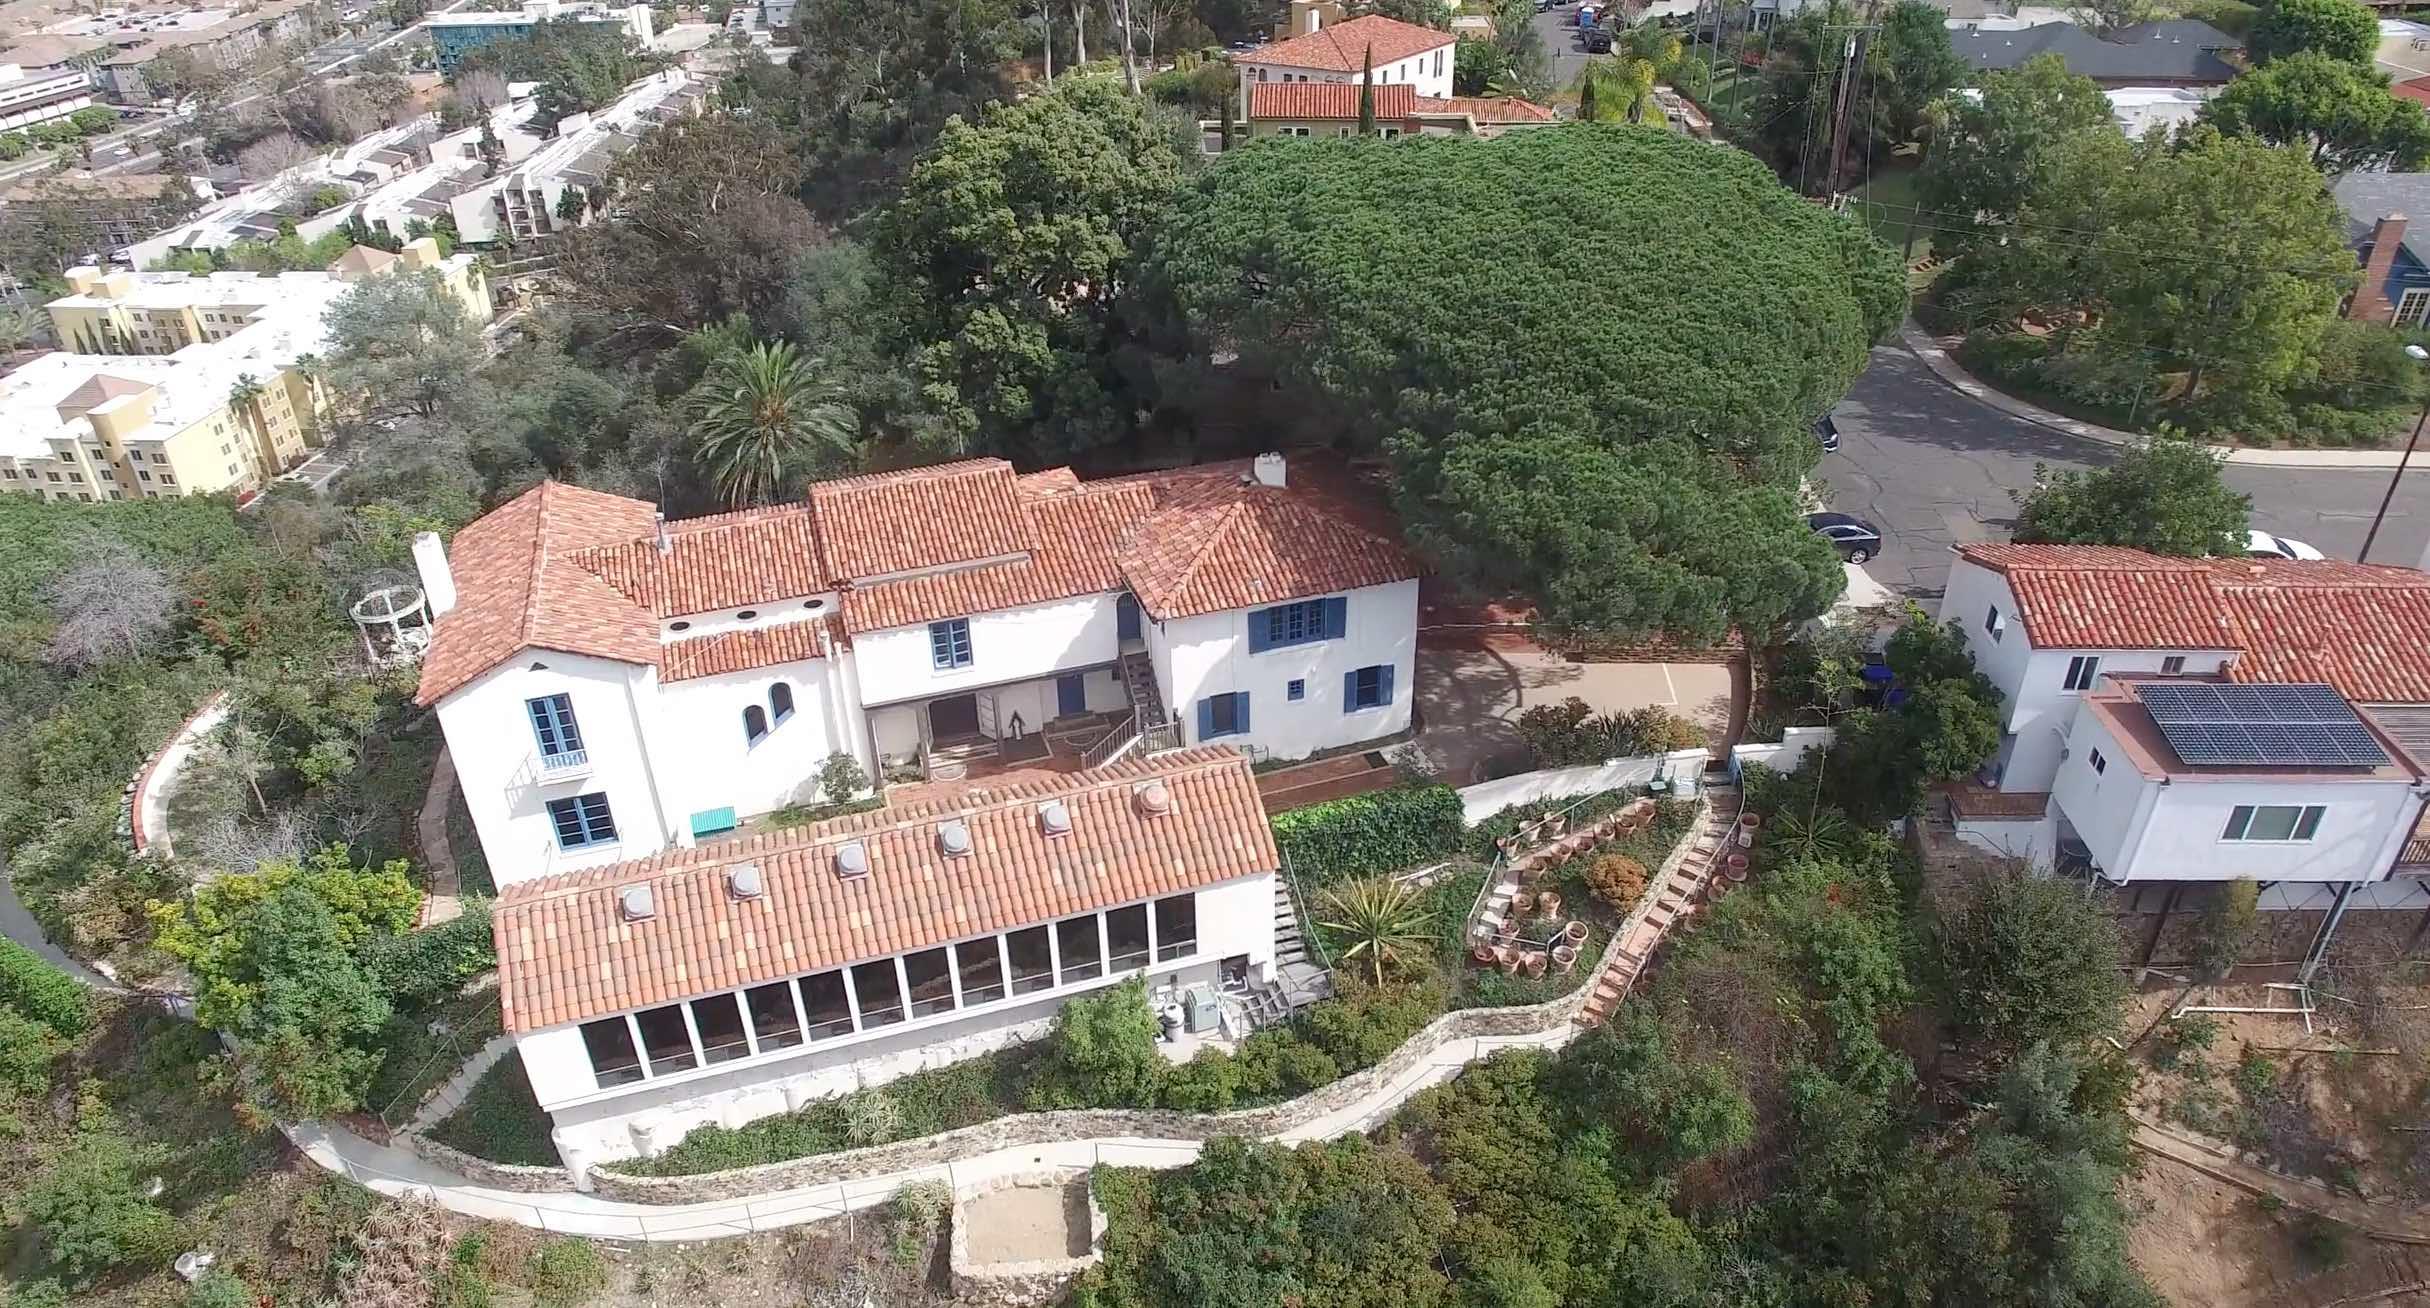 Villa-Hermosa-Aerial-15